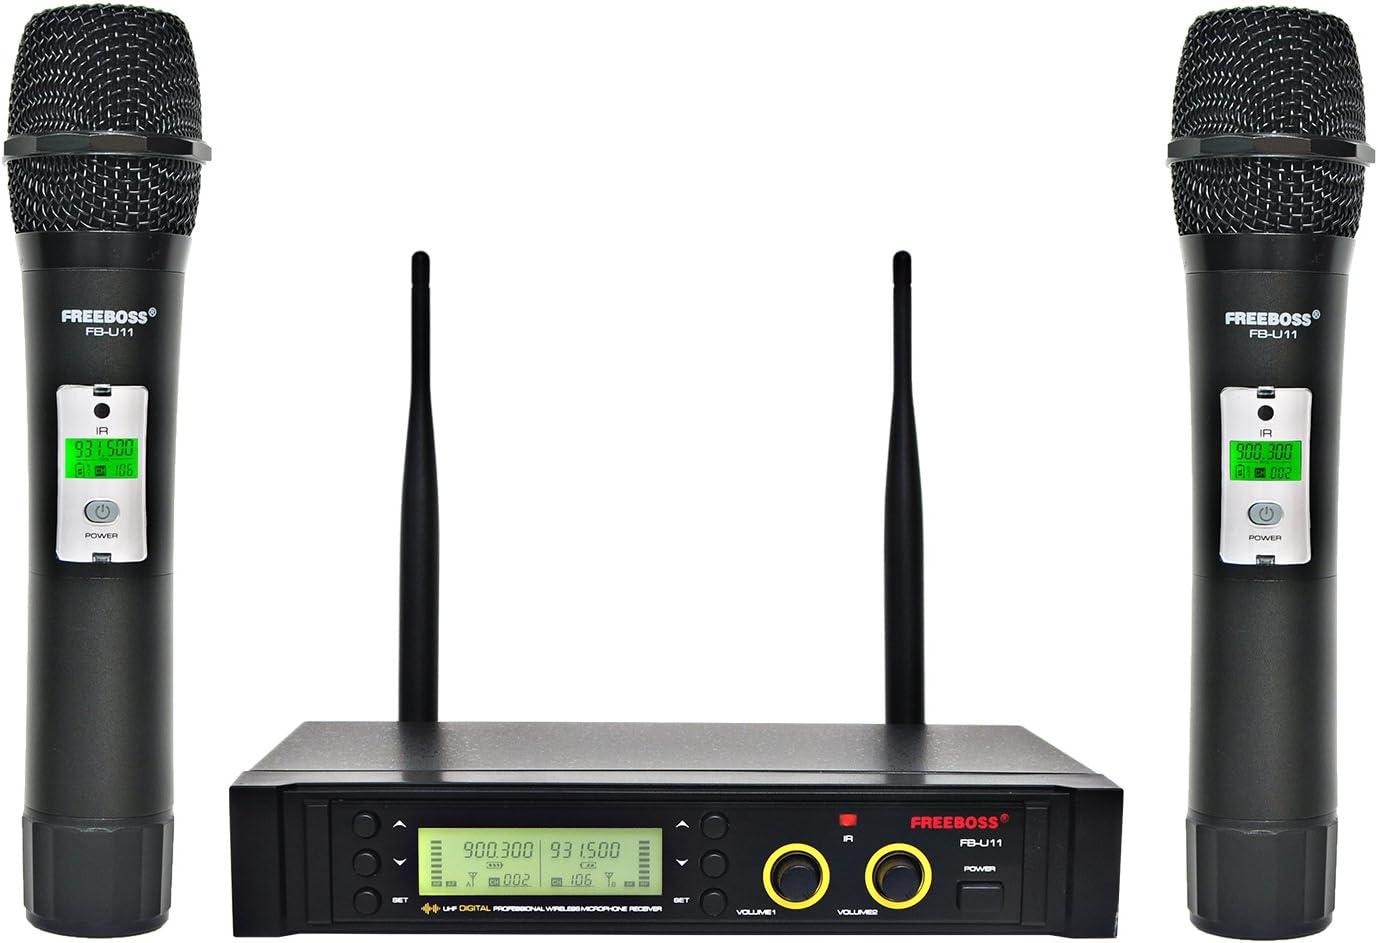 Freeboss FB-U11 UHF Wireless Microphone System Dual Channel IR 2x100 Frequency Wireless Microphone (FB-U11)